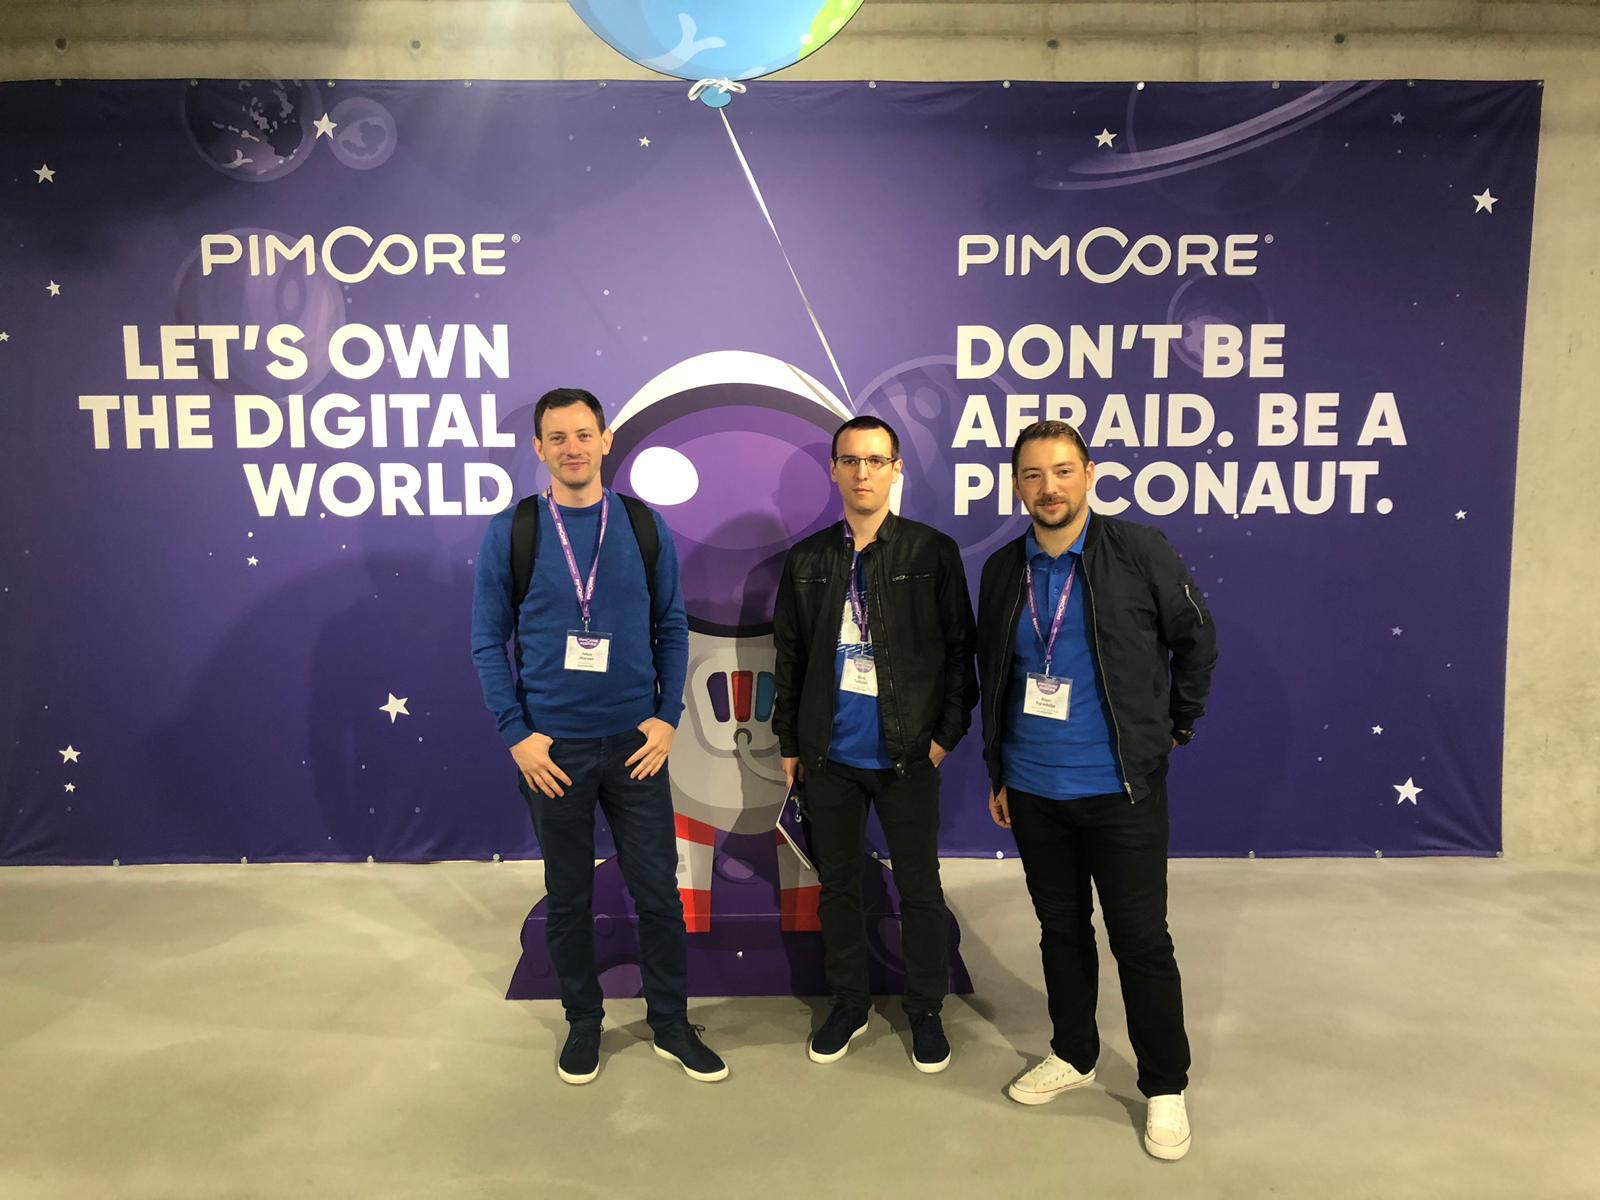 Pimcore Partner conference in 2019